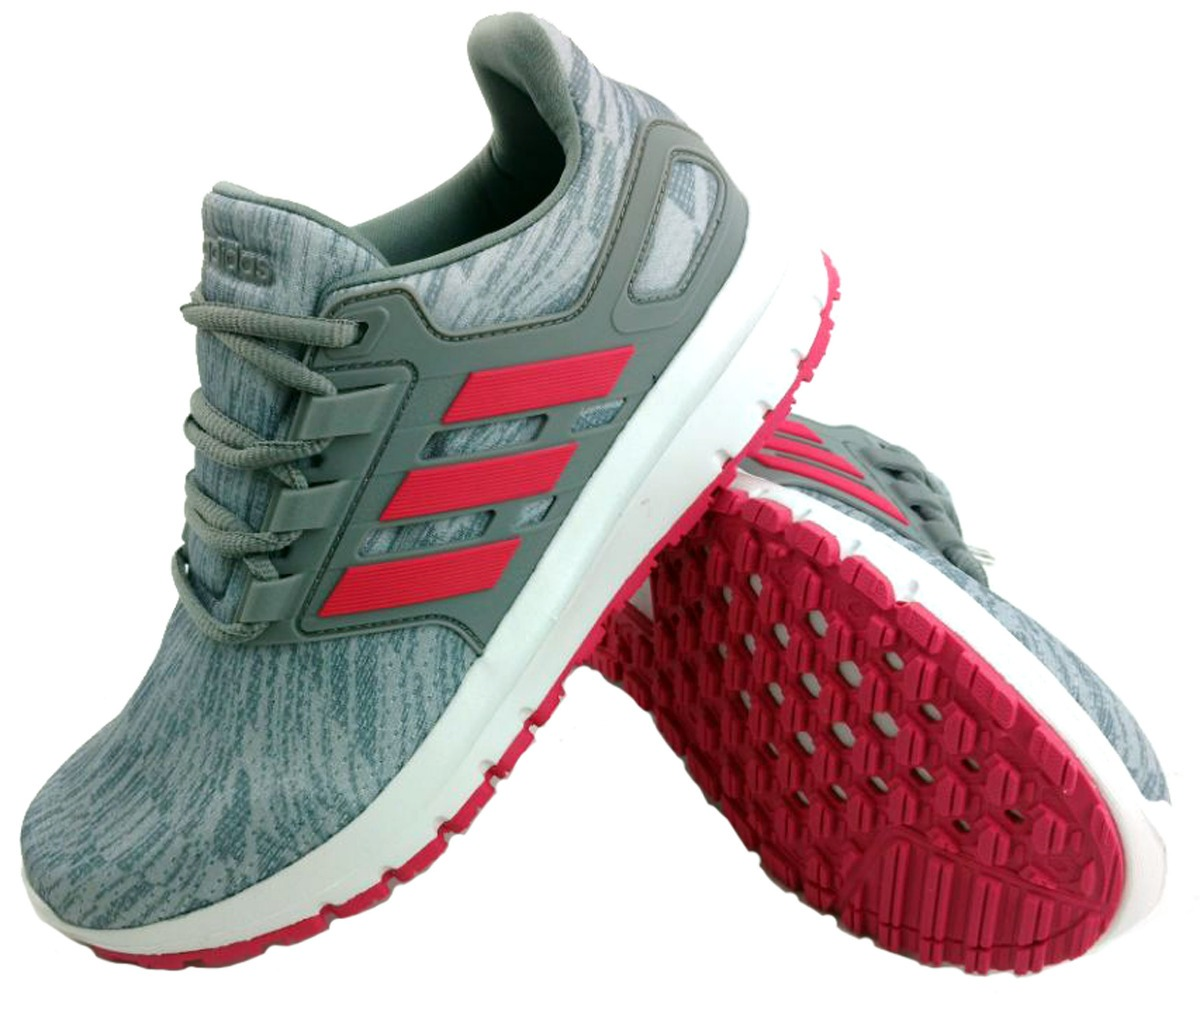 new style e1656 36ad9 zapatilla adidas energy cloud 2 gris mujer running empo2000. Cargando zoom.